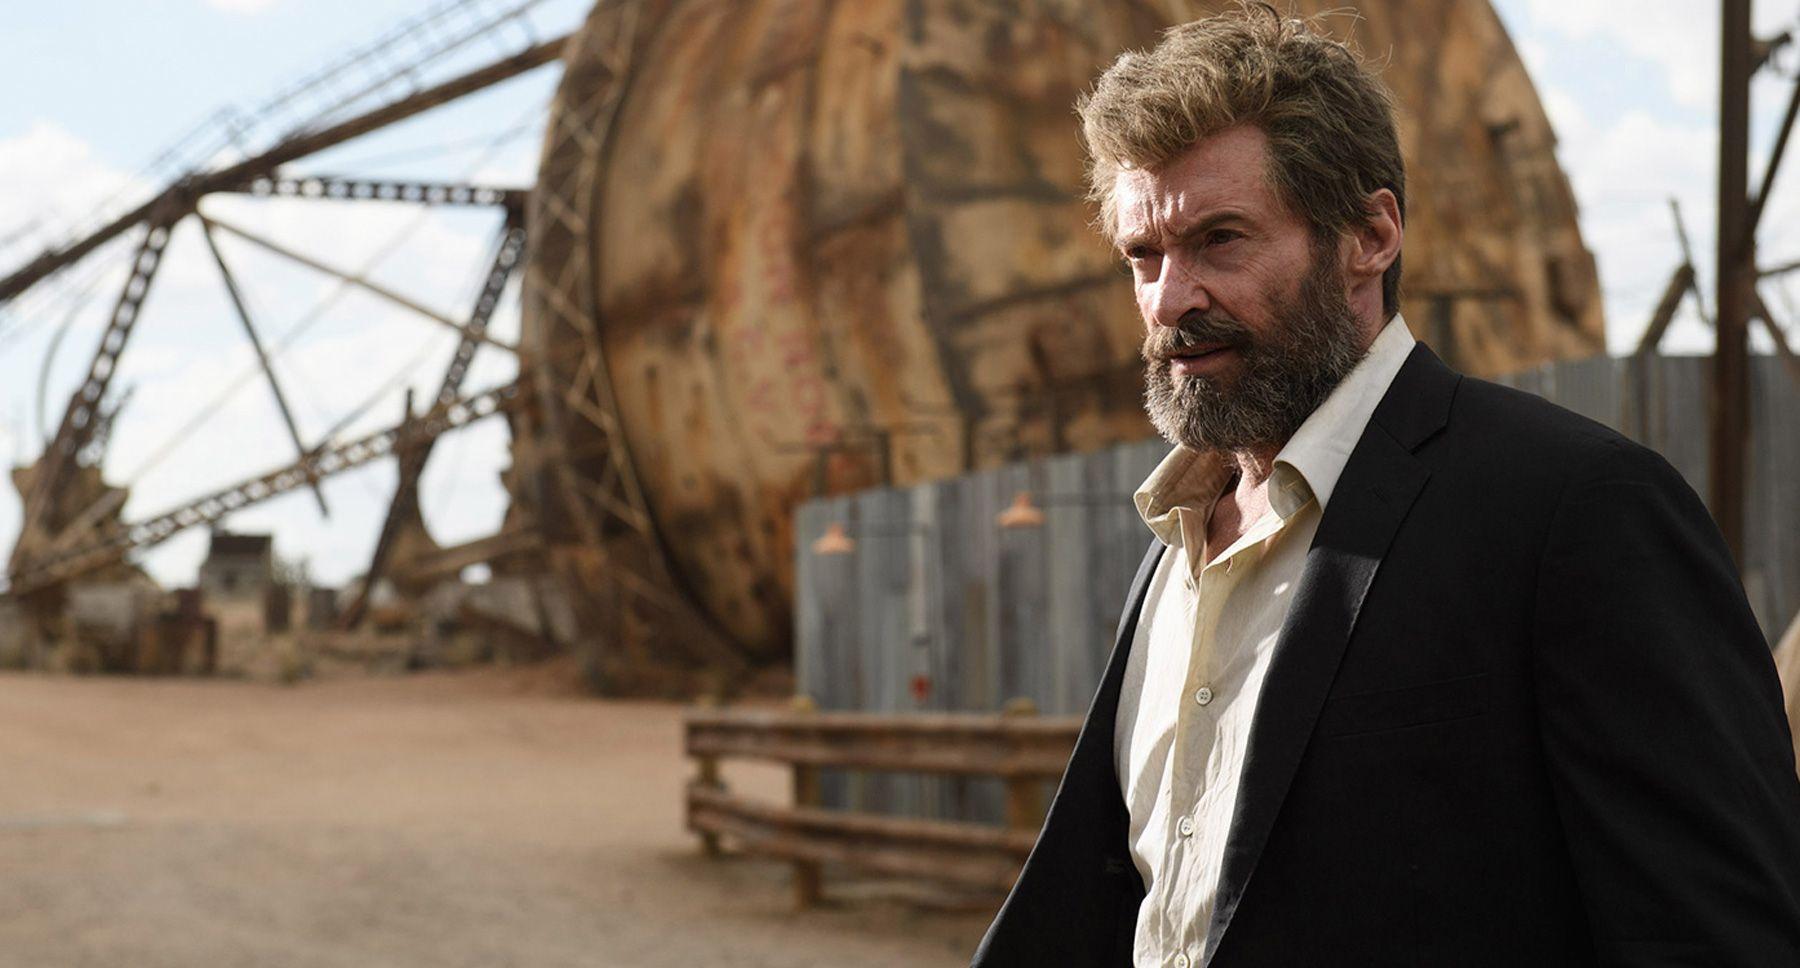 Logan nominated for Oscar